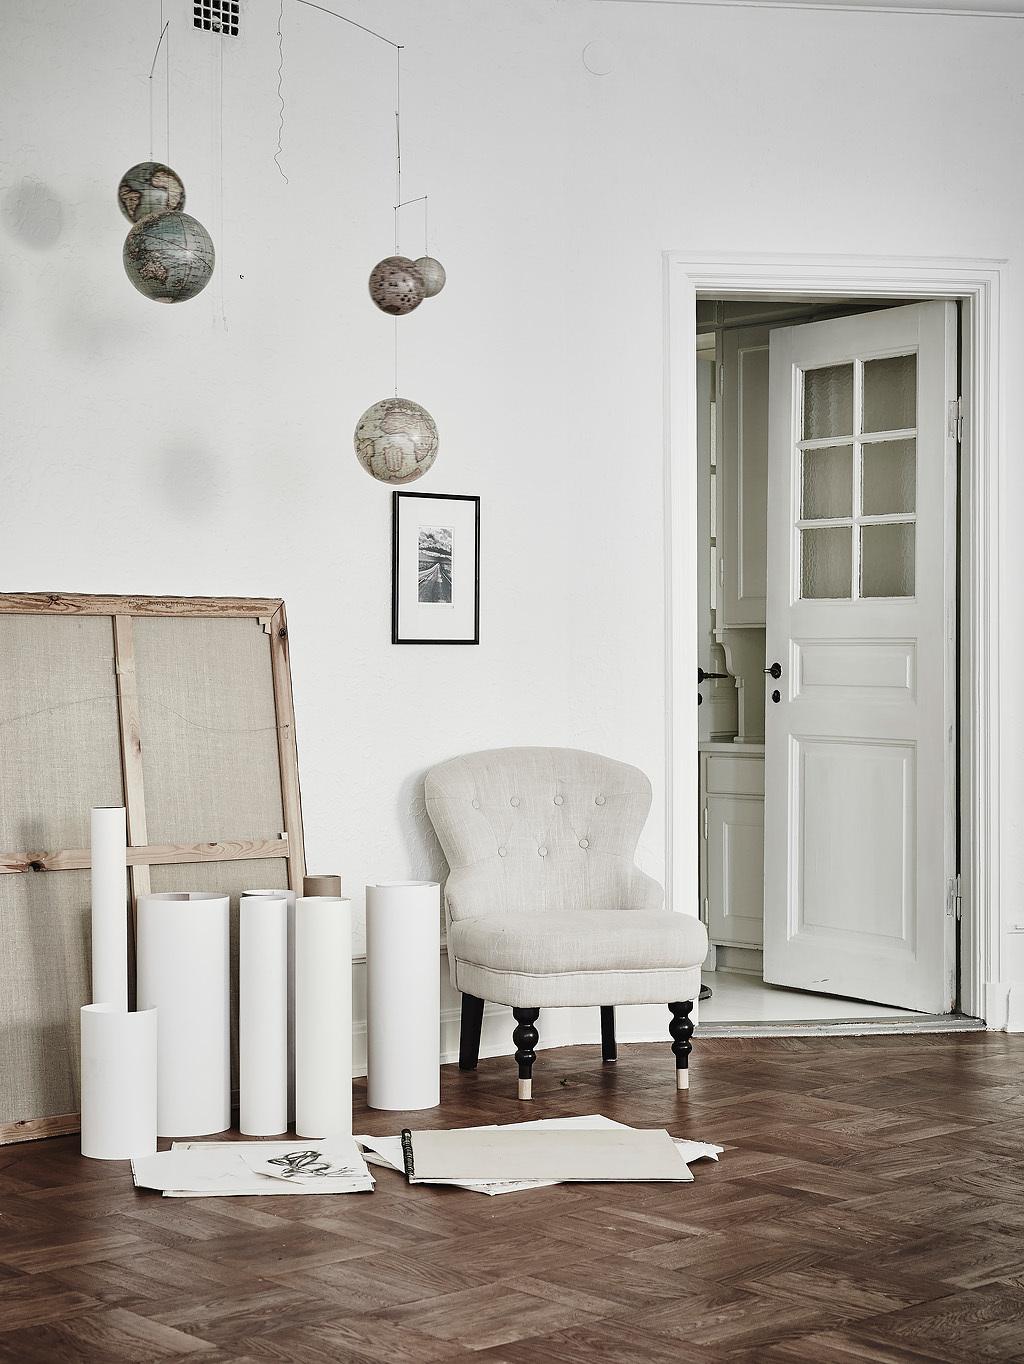 home-tour-splendide-salon-fauteuil-globe-teresstre-mademoiselle-claudine